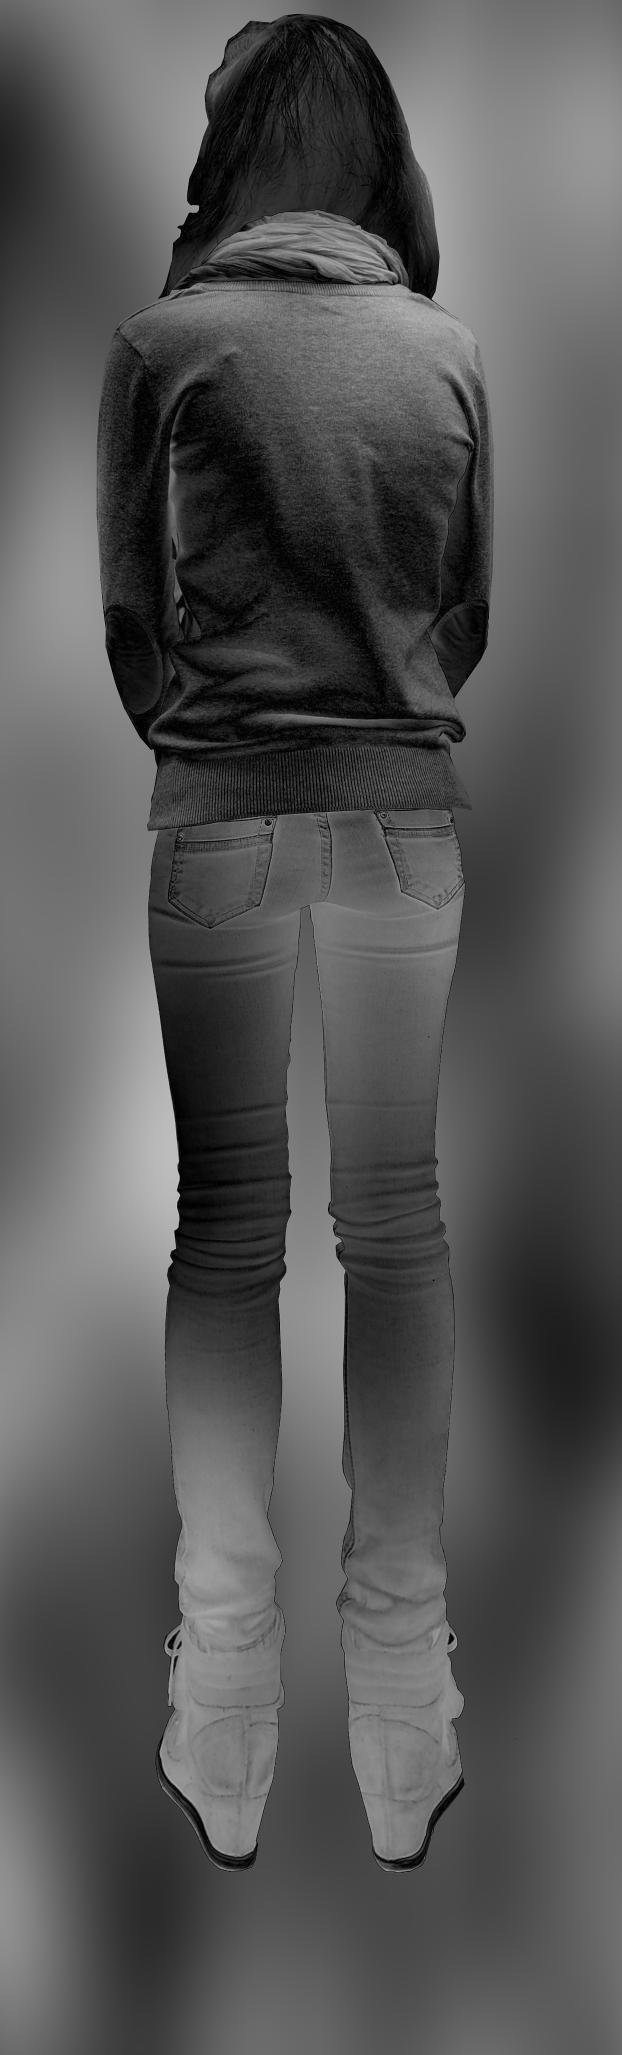 traff jeans hintern  -  Mies-Vandenbergh-Fotografie